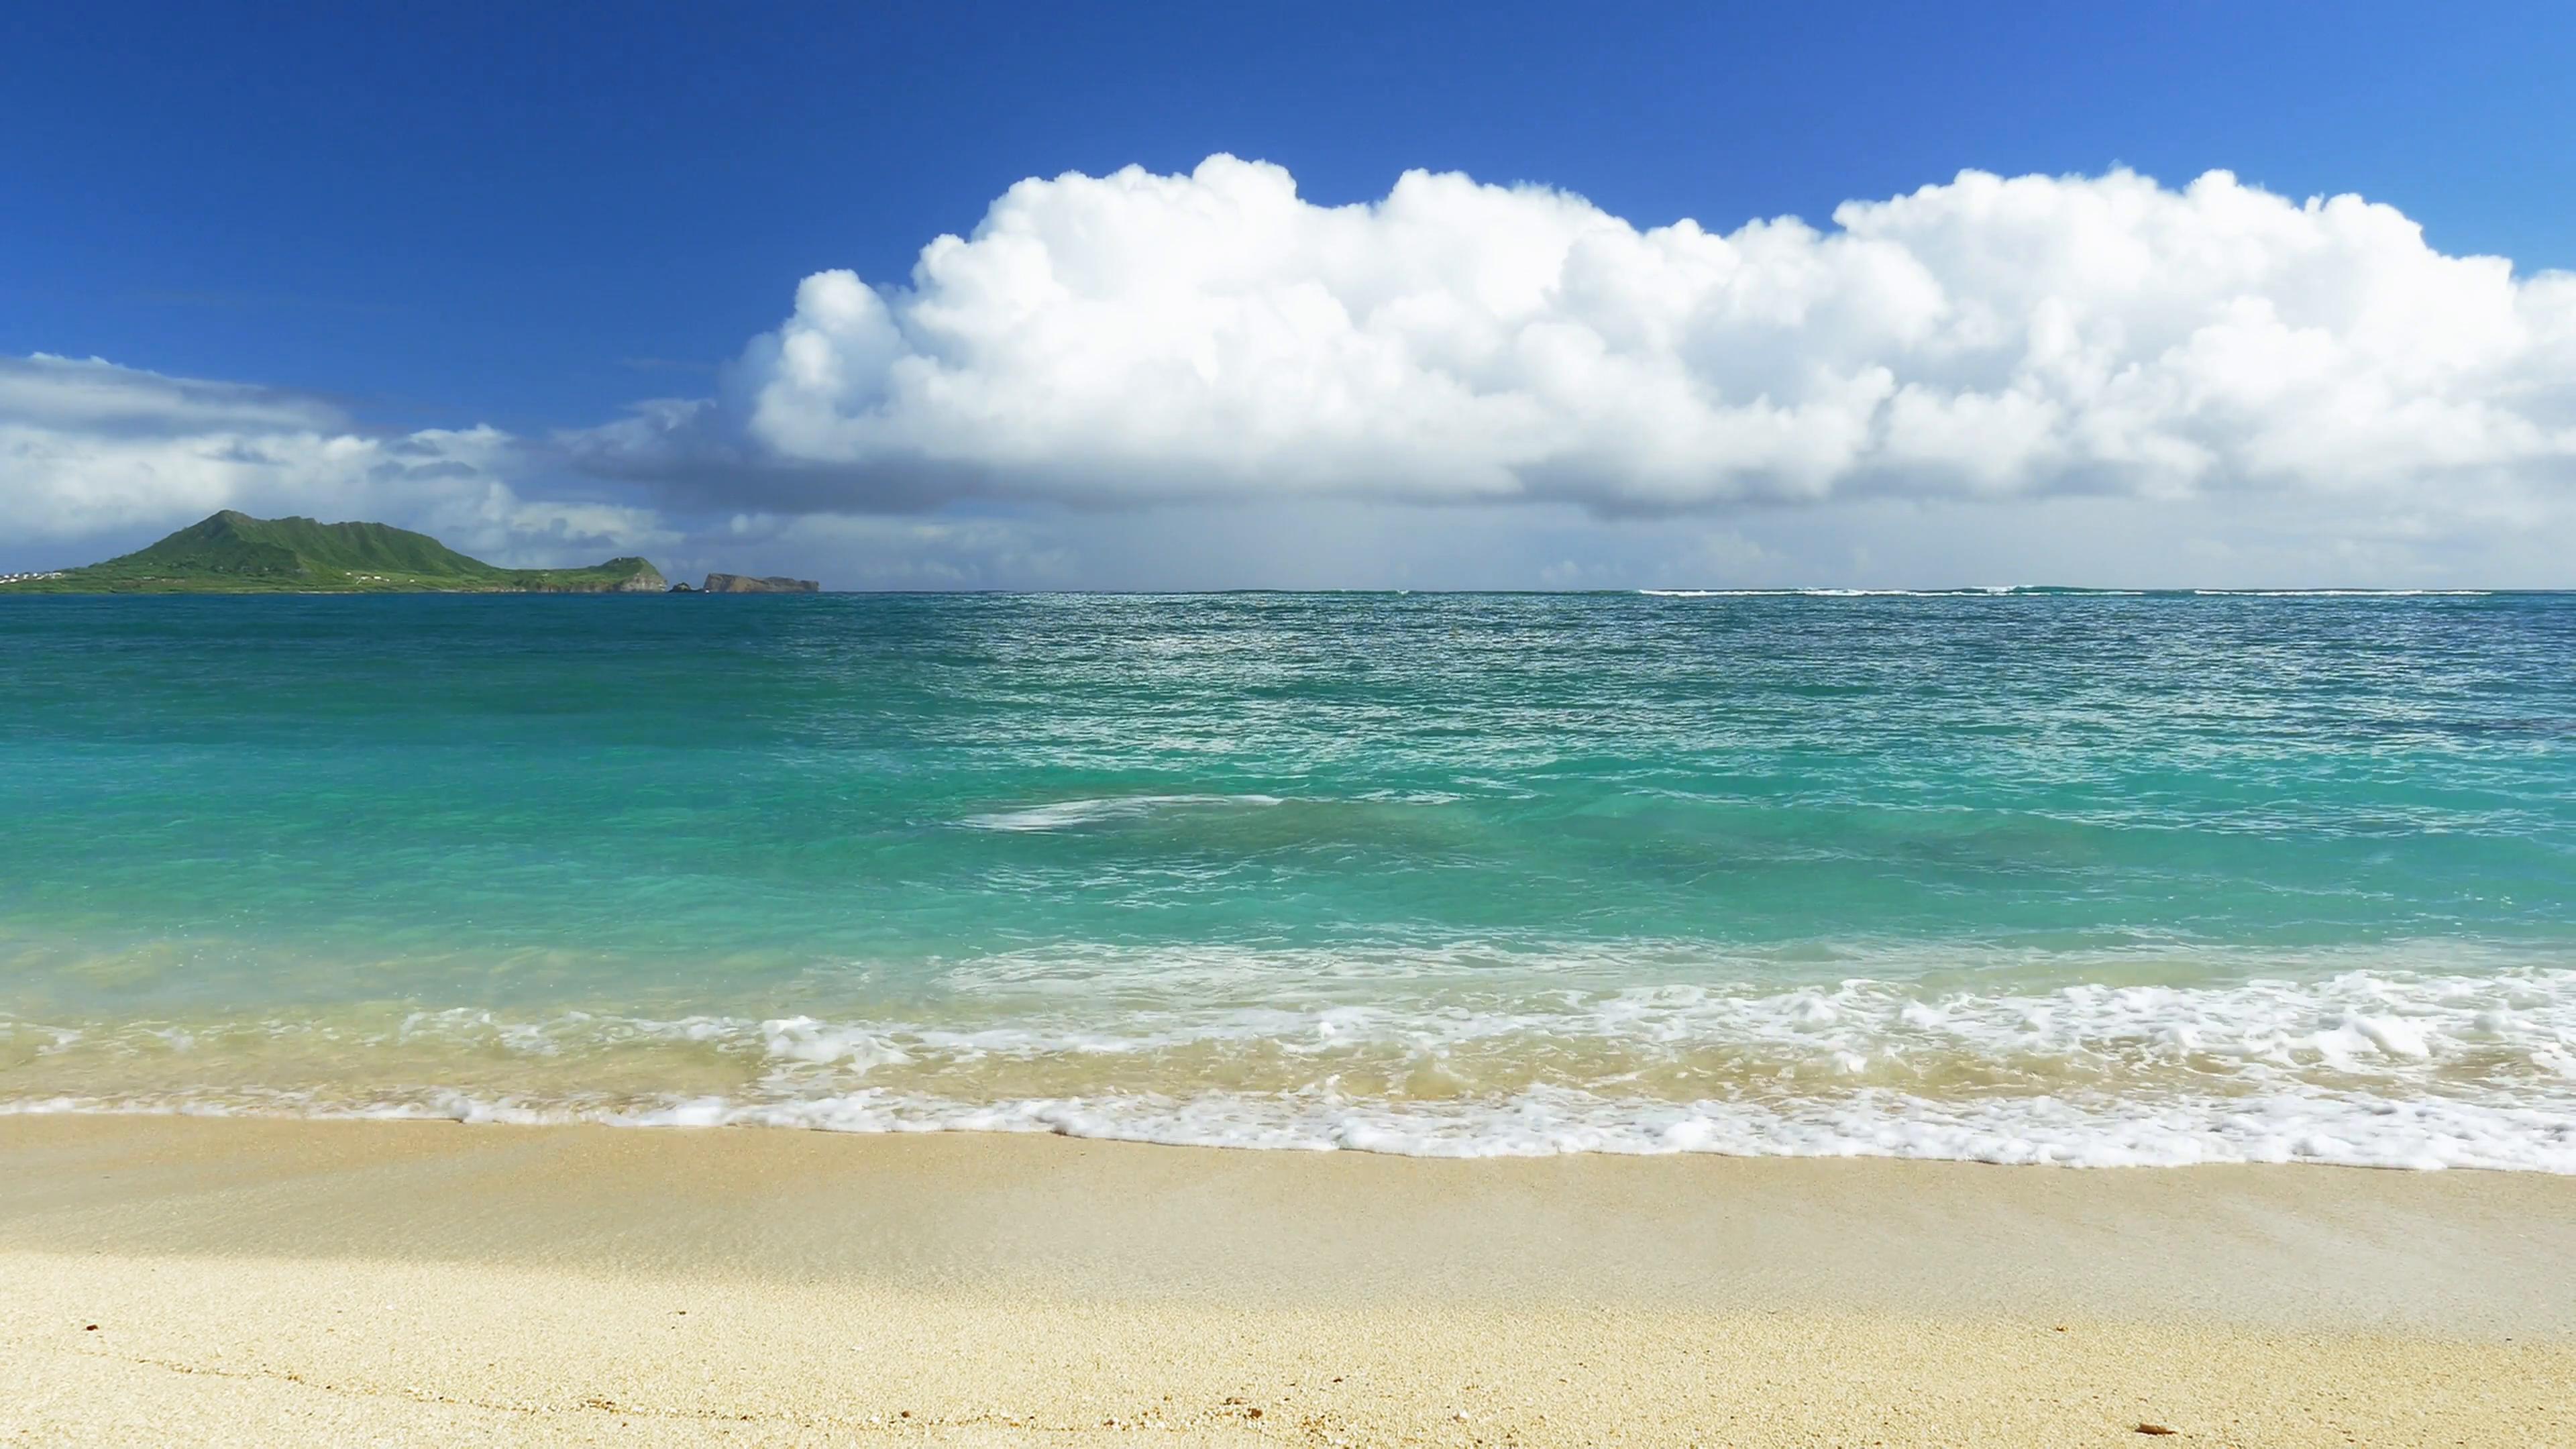 Beautiful Beach Images Hd Nature: Hawaii PNG HD Transparent Hawaii HD.PNG Images.